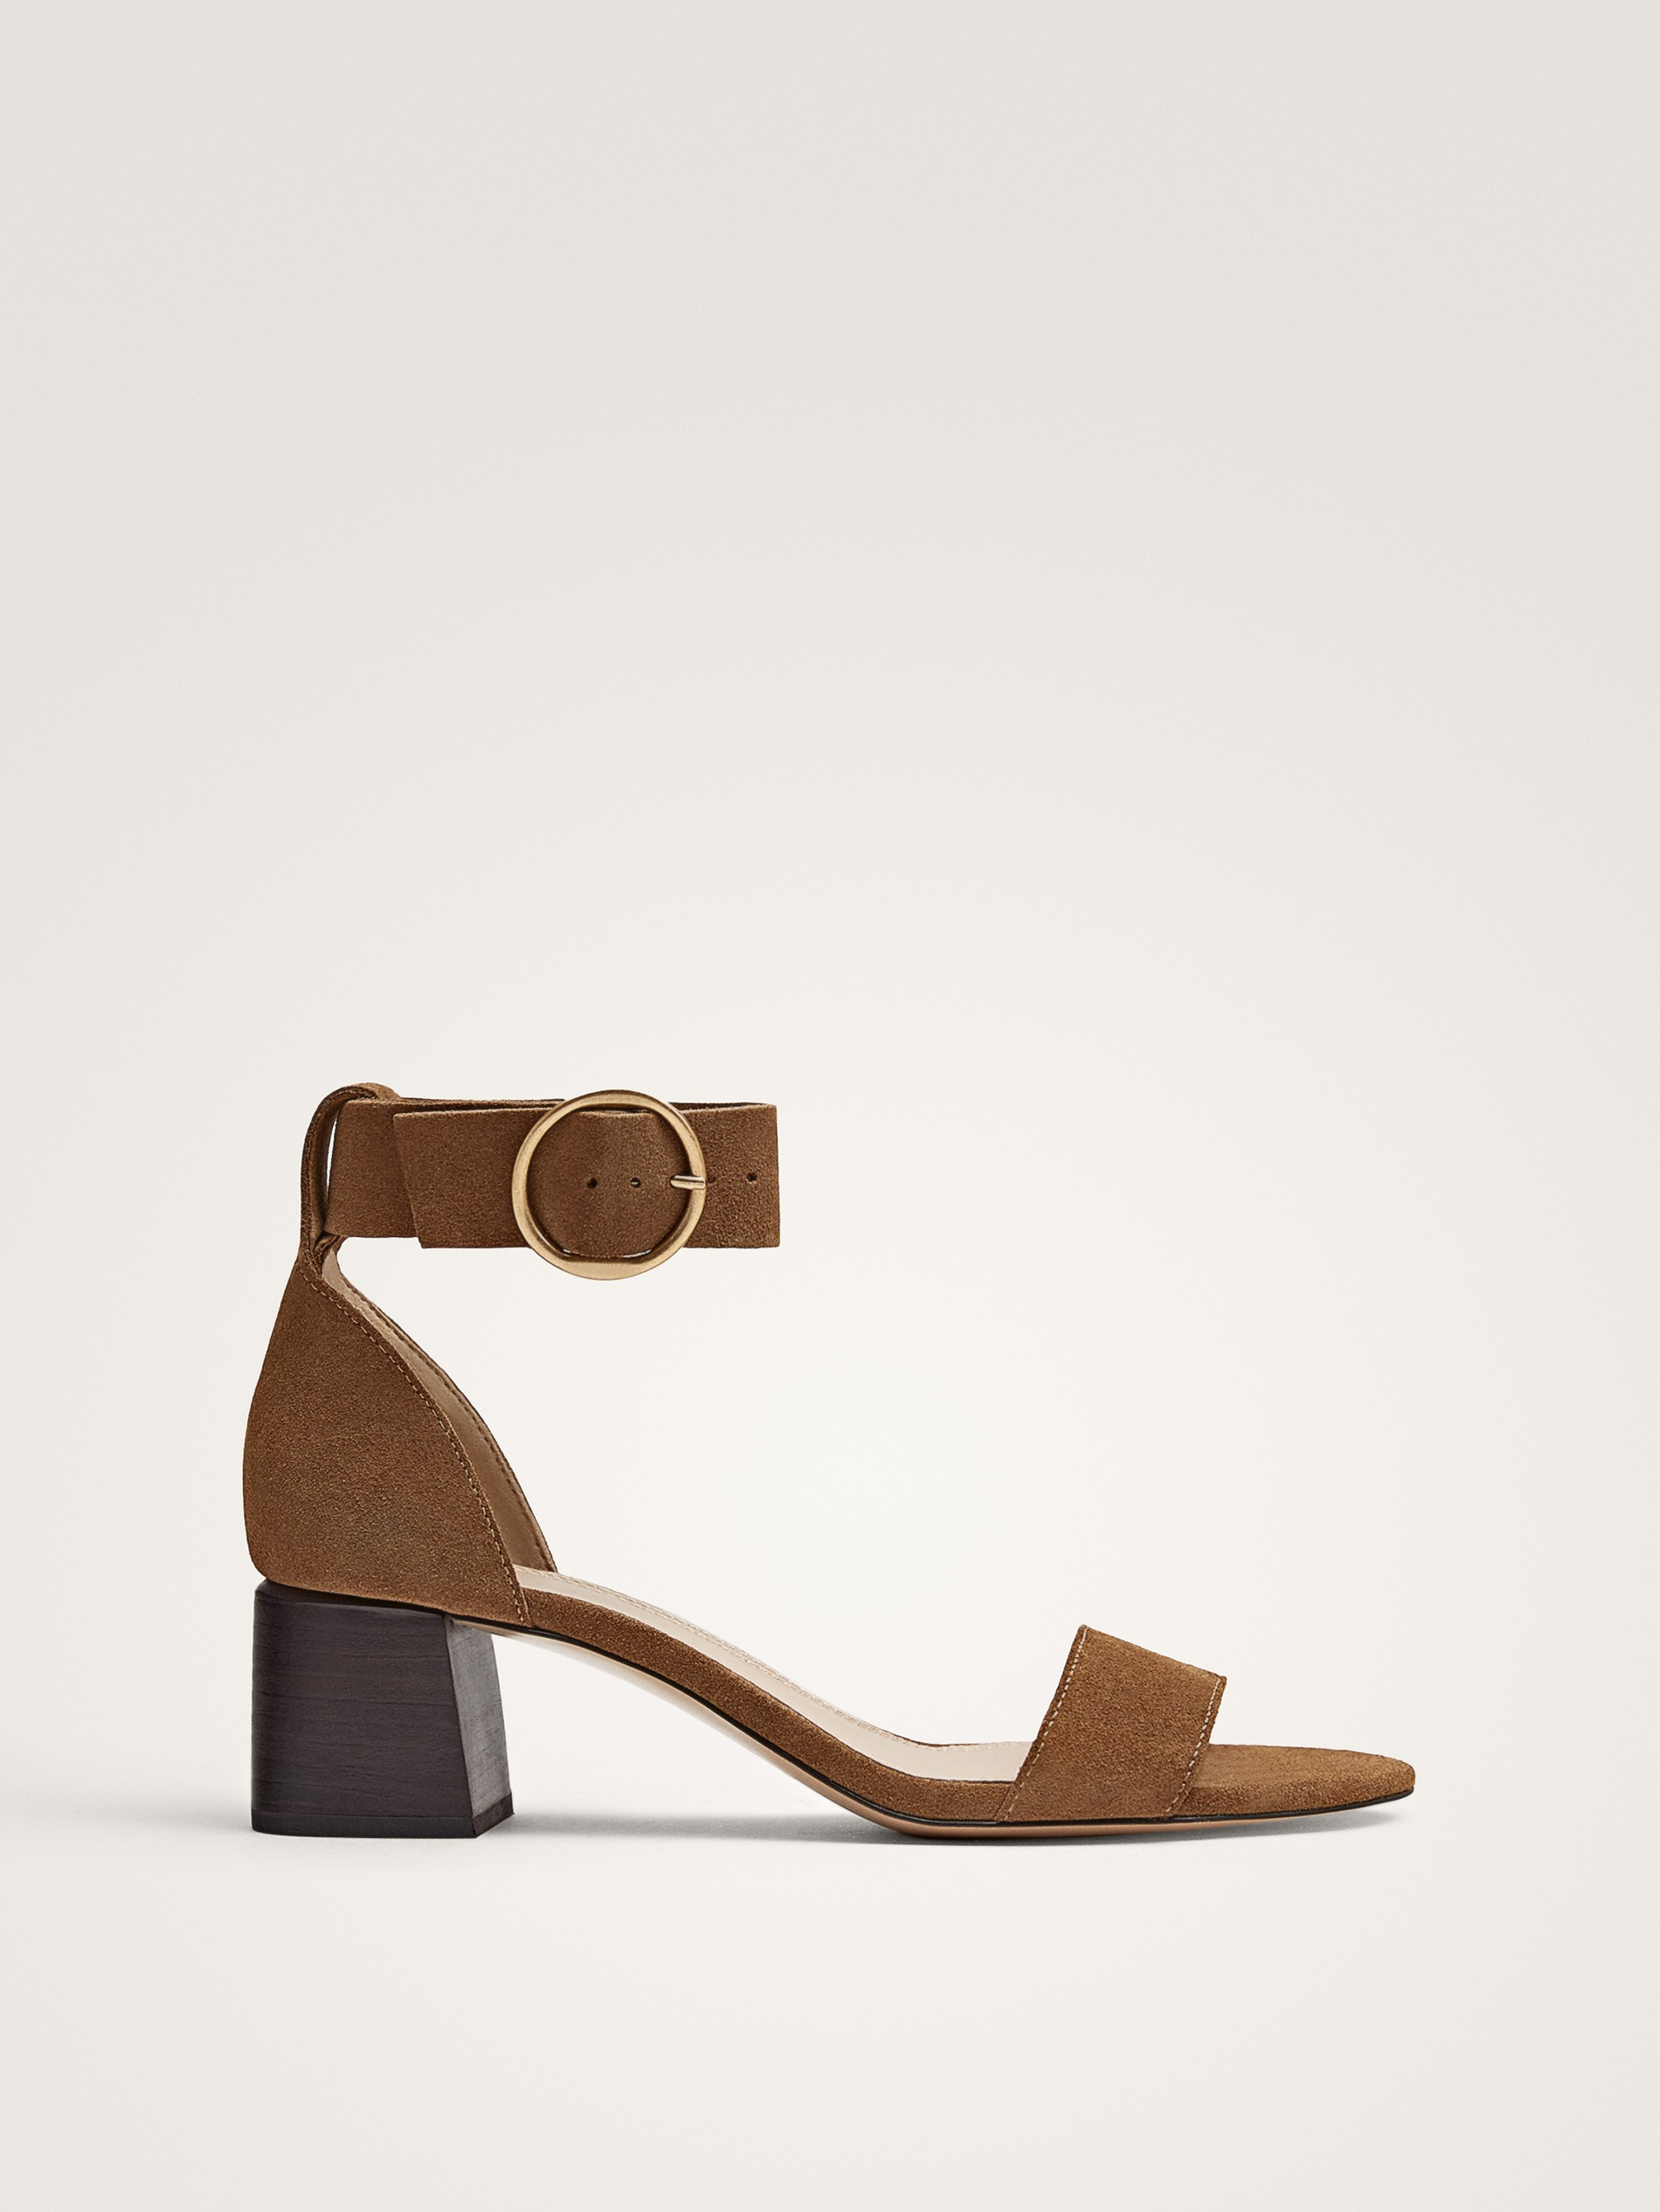 Zapatos Massimo Rebajas Mujer España Dutti Aq54l3rsjc xBoedrC